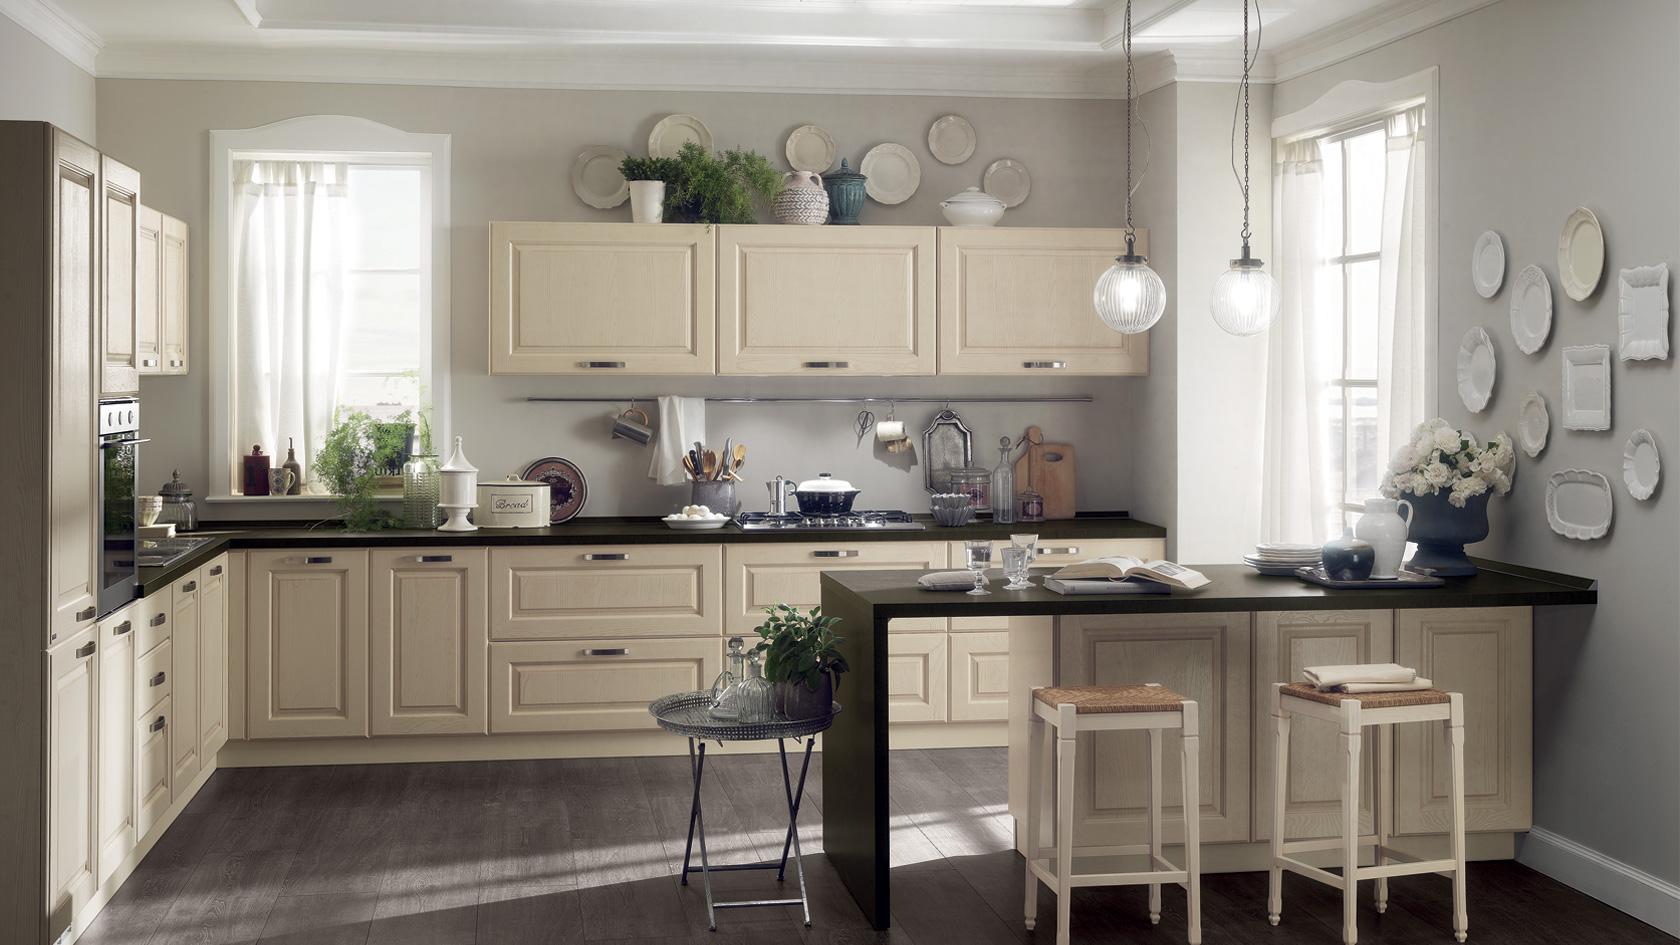 Mobili Contemporanei Cucina : Foto gratis cucina contemporaneo interni mobili camera